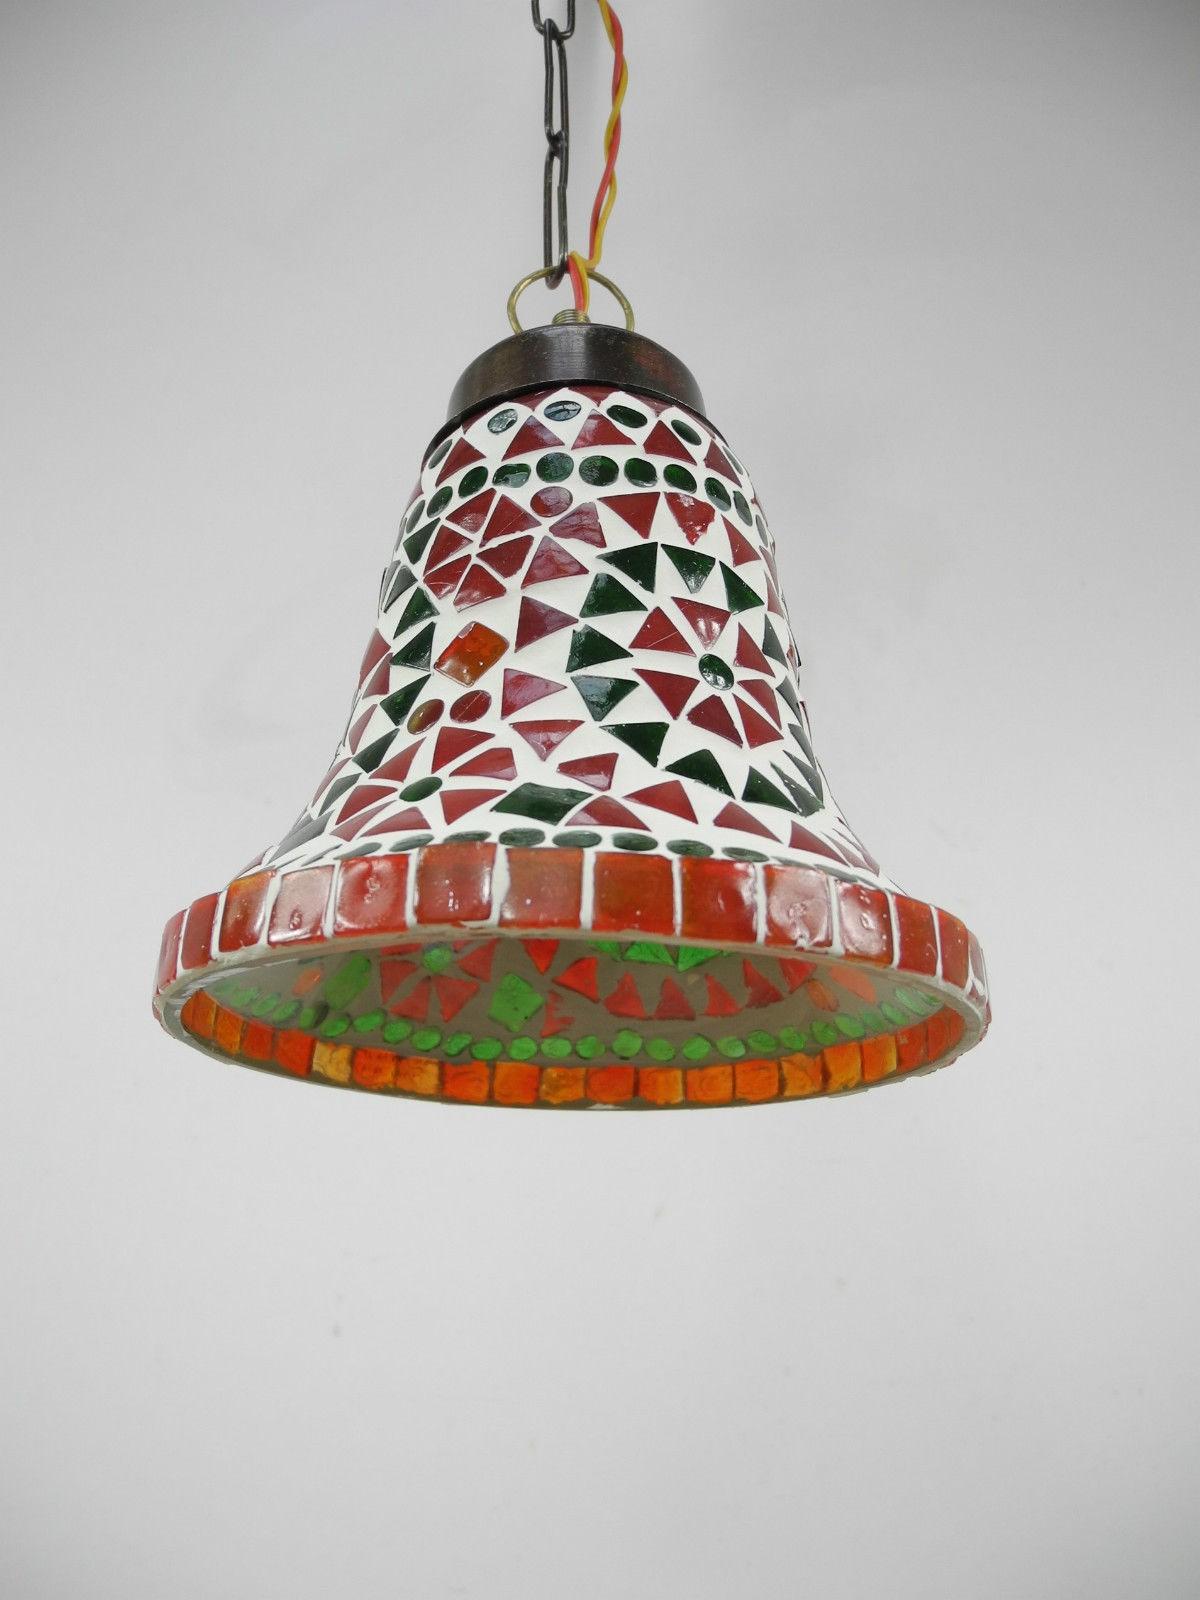 H nge mosaik lampen glocke orientalisch dekoleuchte bunt color nr 7405 ebay for Mosaik lampe orientalisch